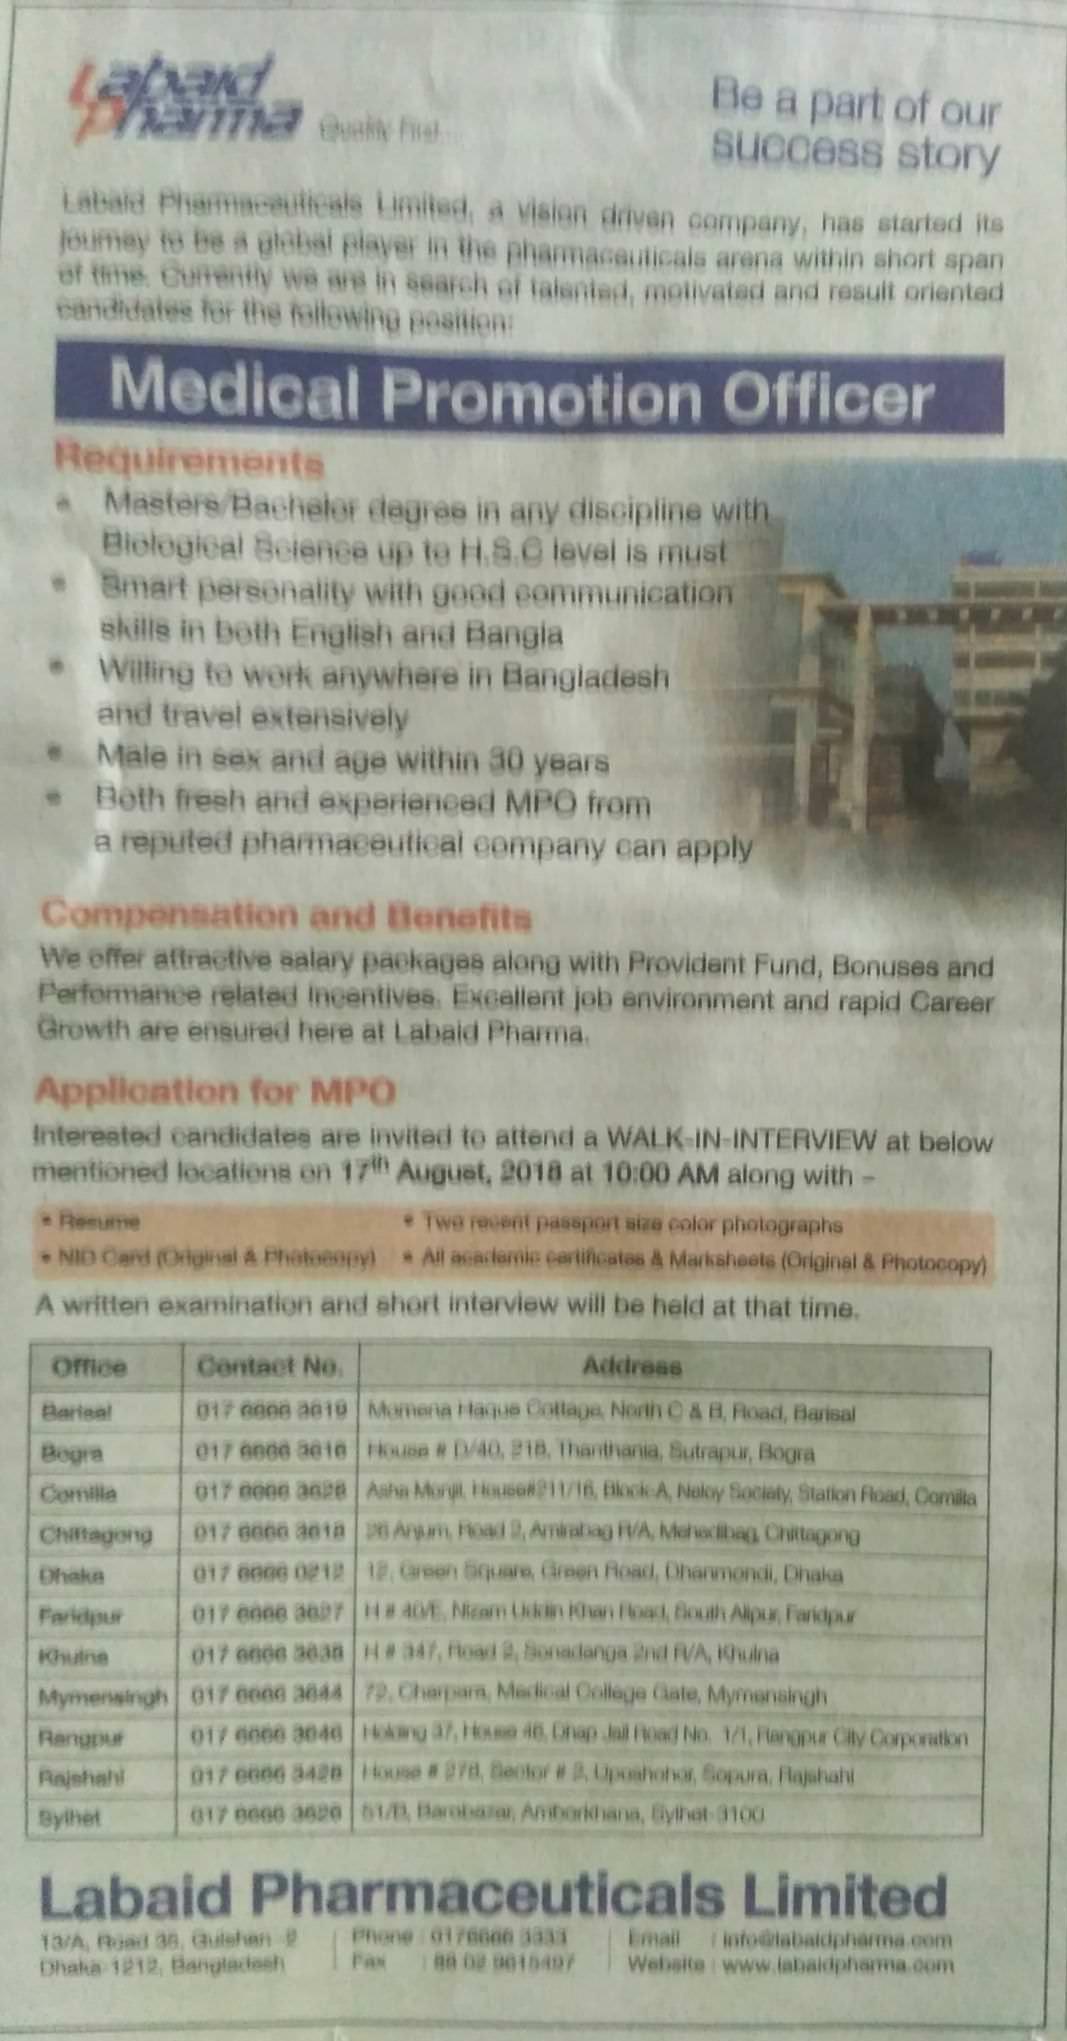 Labaid Pharmaceuticals Limited Job Circular 2018